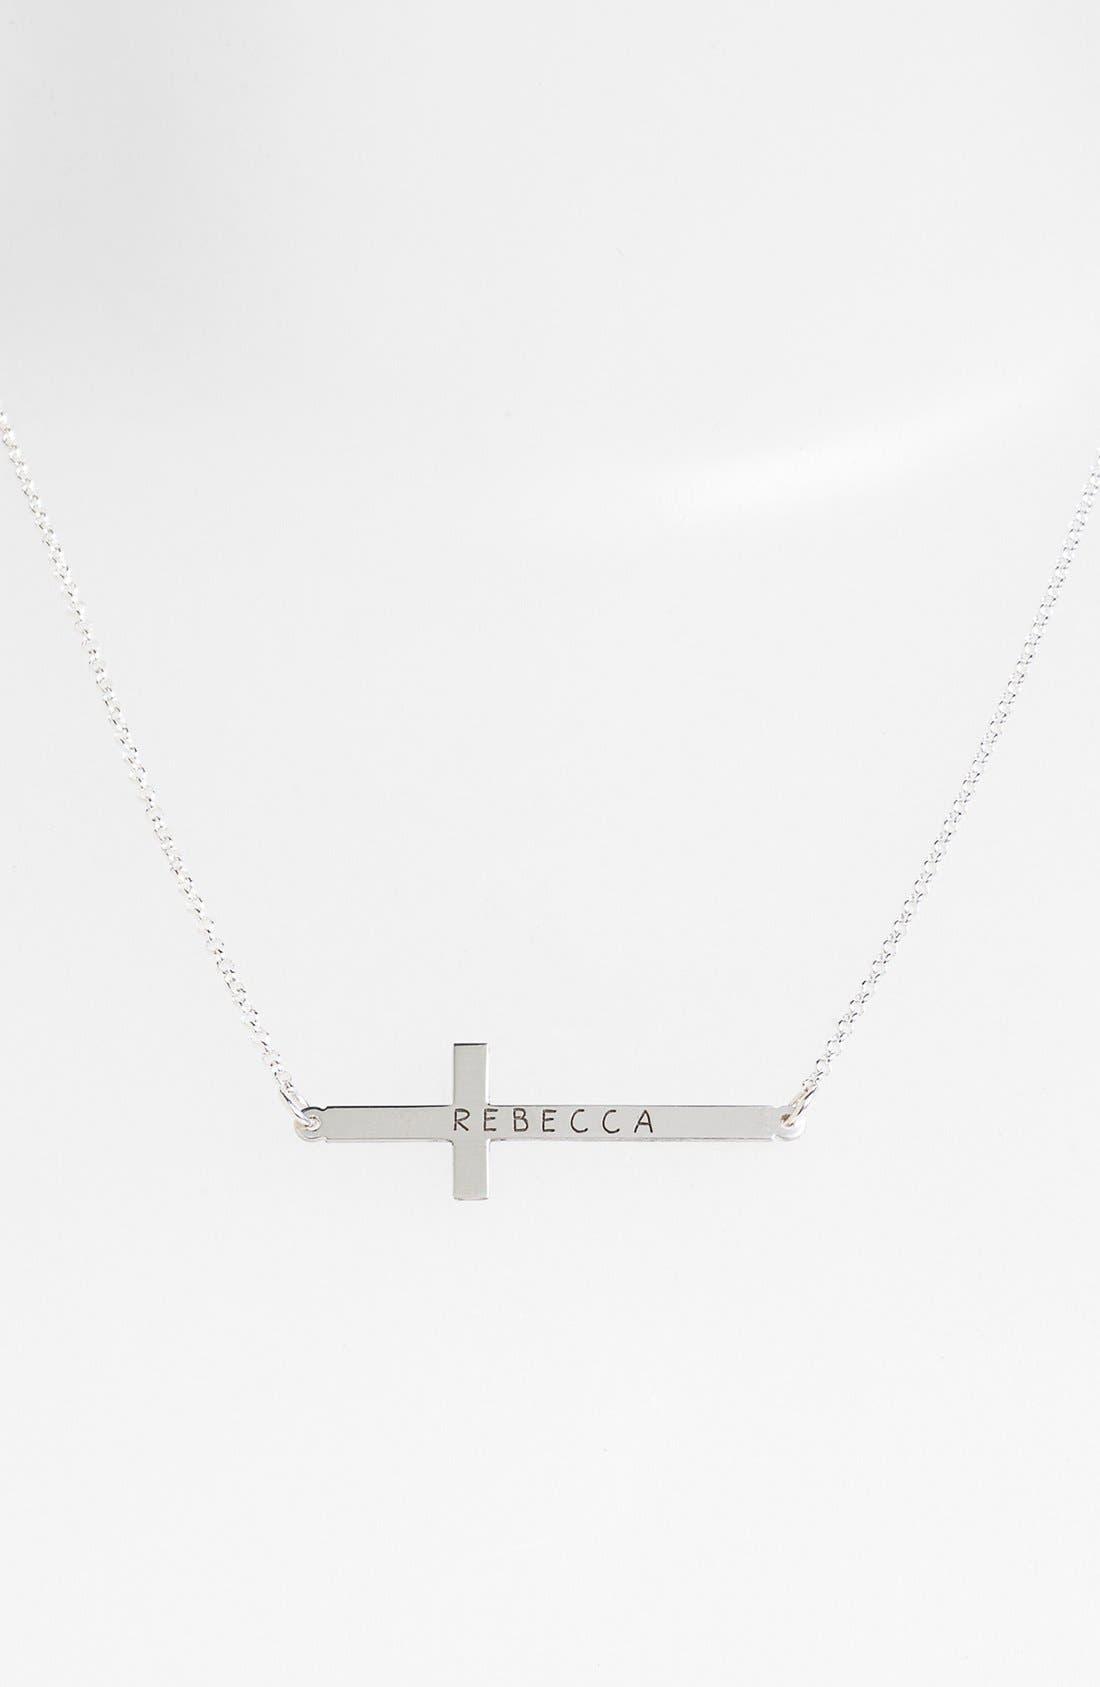 Alternate Image 1 Selected - Argento Vivo Personalized Sideway Cross Monogram Necklace (Nordstrom Exclusive)